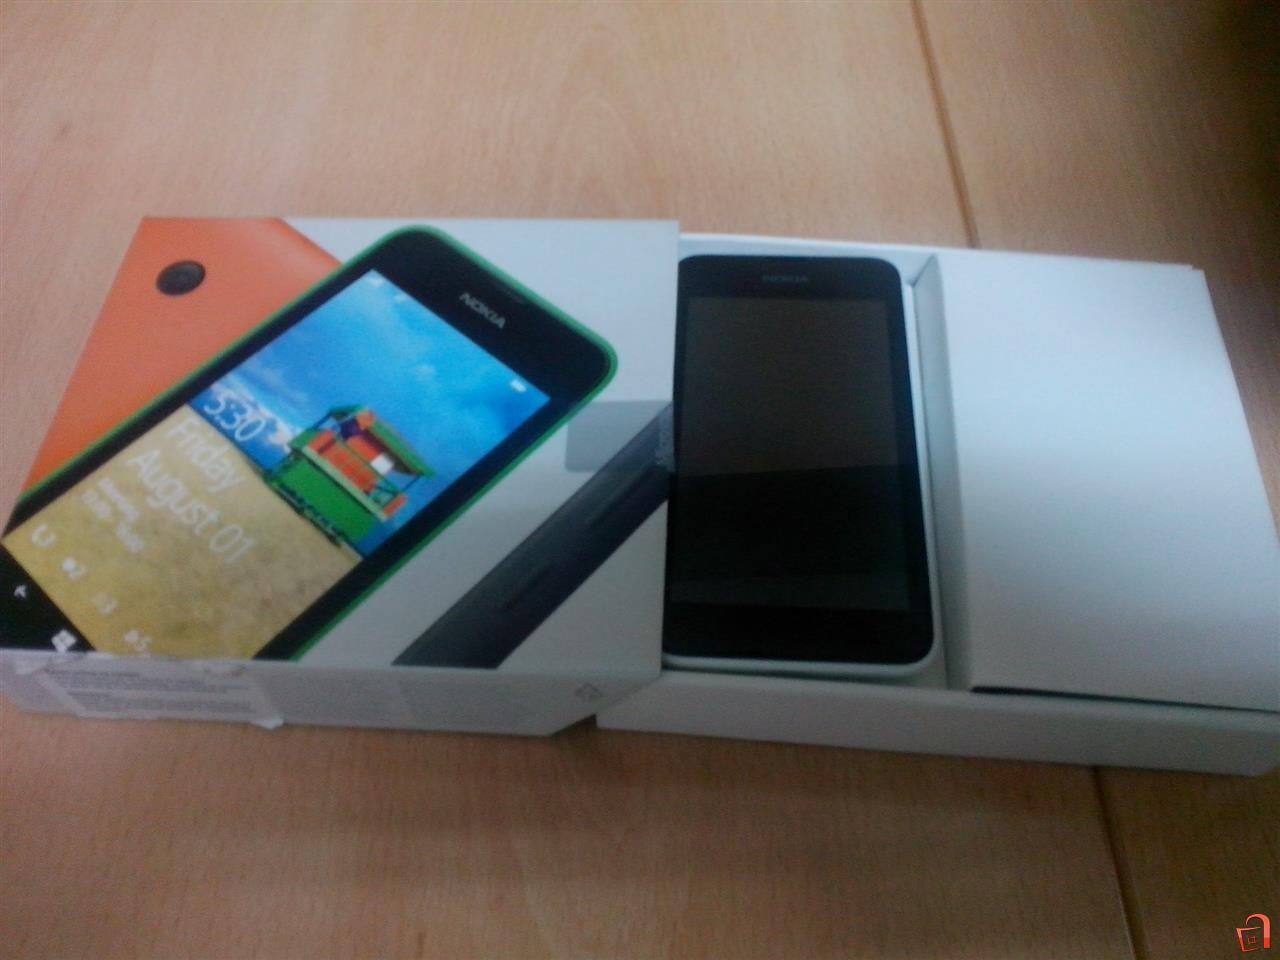 Ad Nokia Lumia 530 For Sale Skopje Karposh Electronics Mobile Phones 2306459